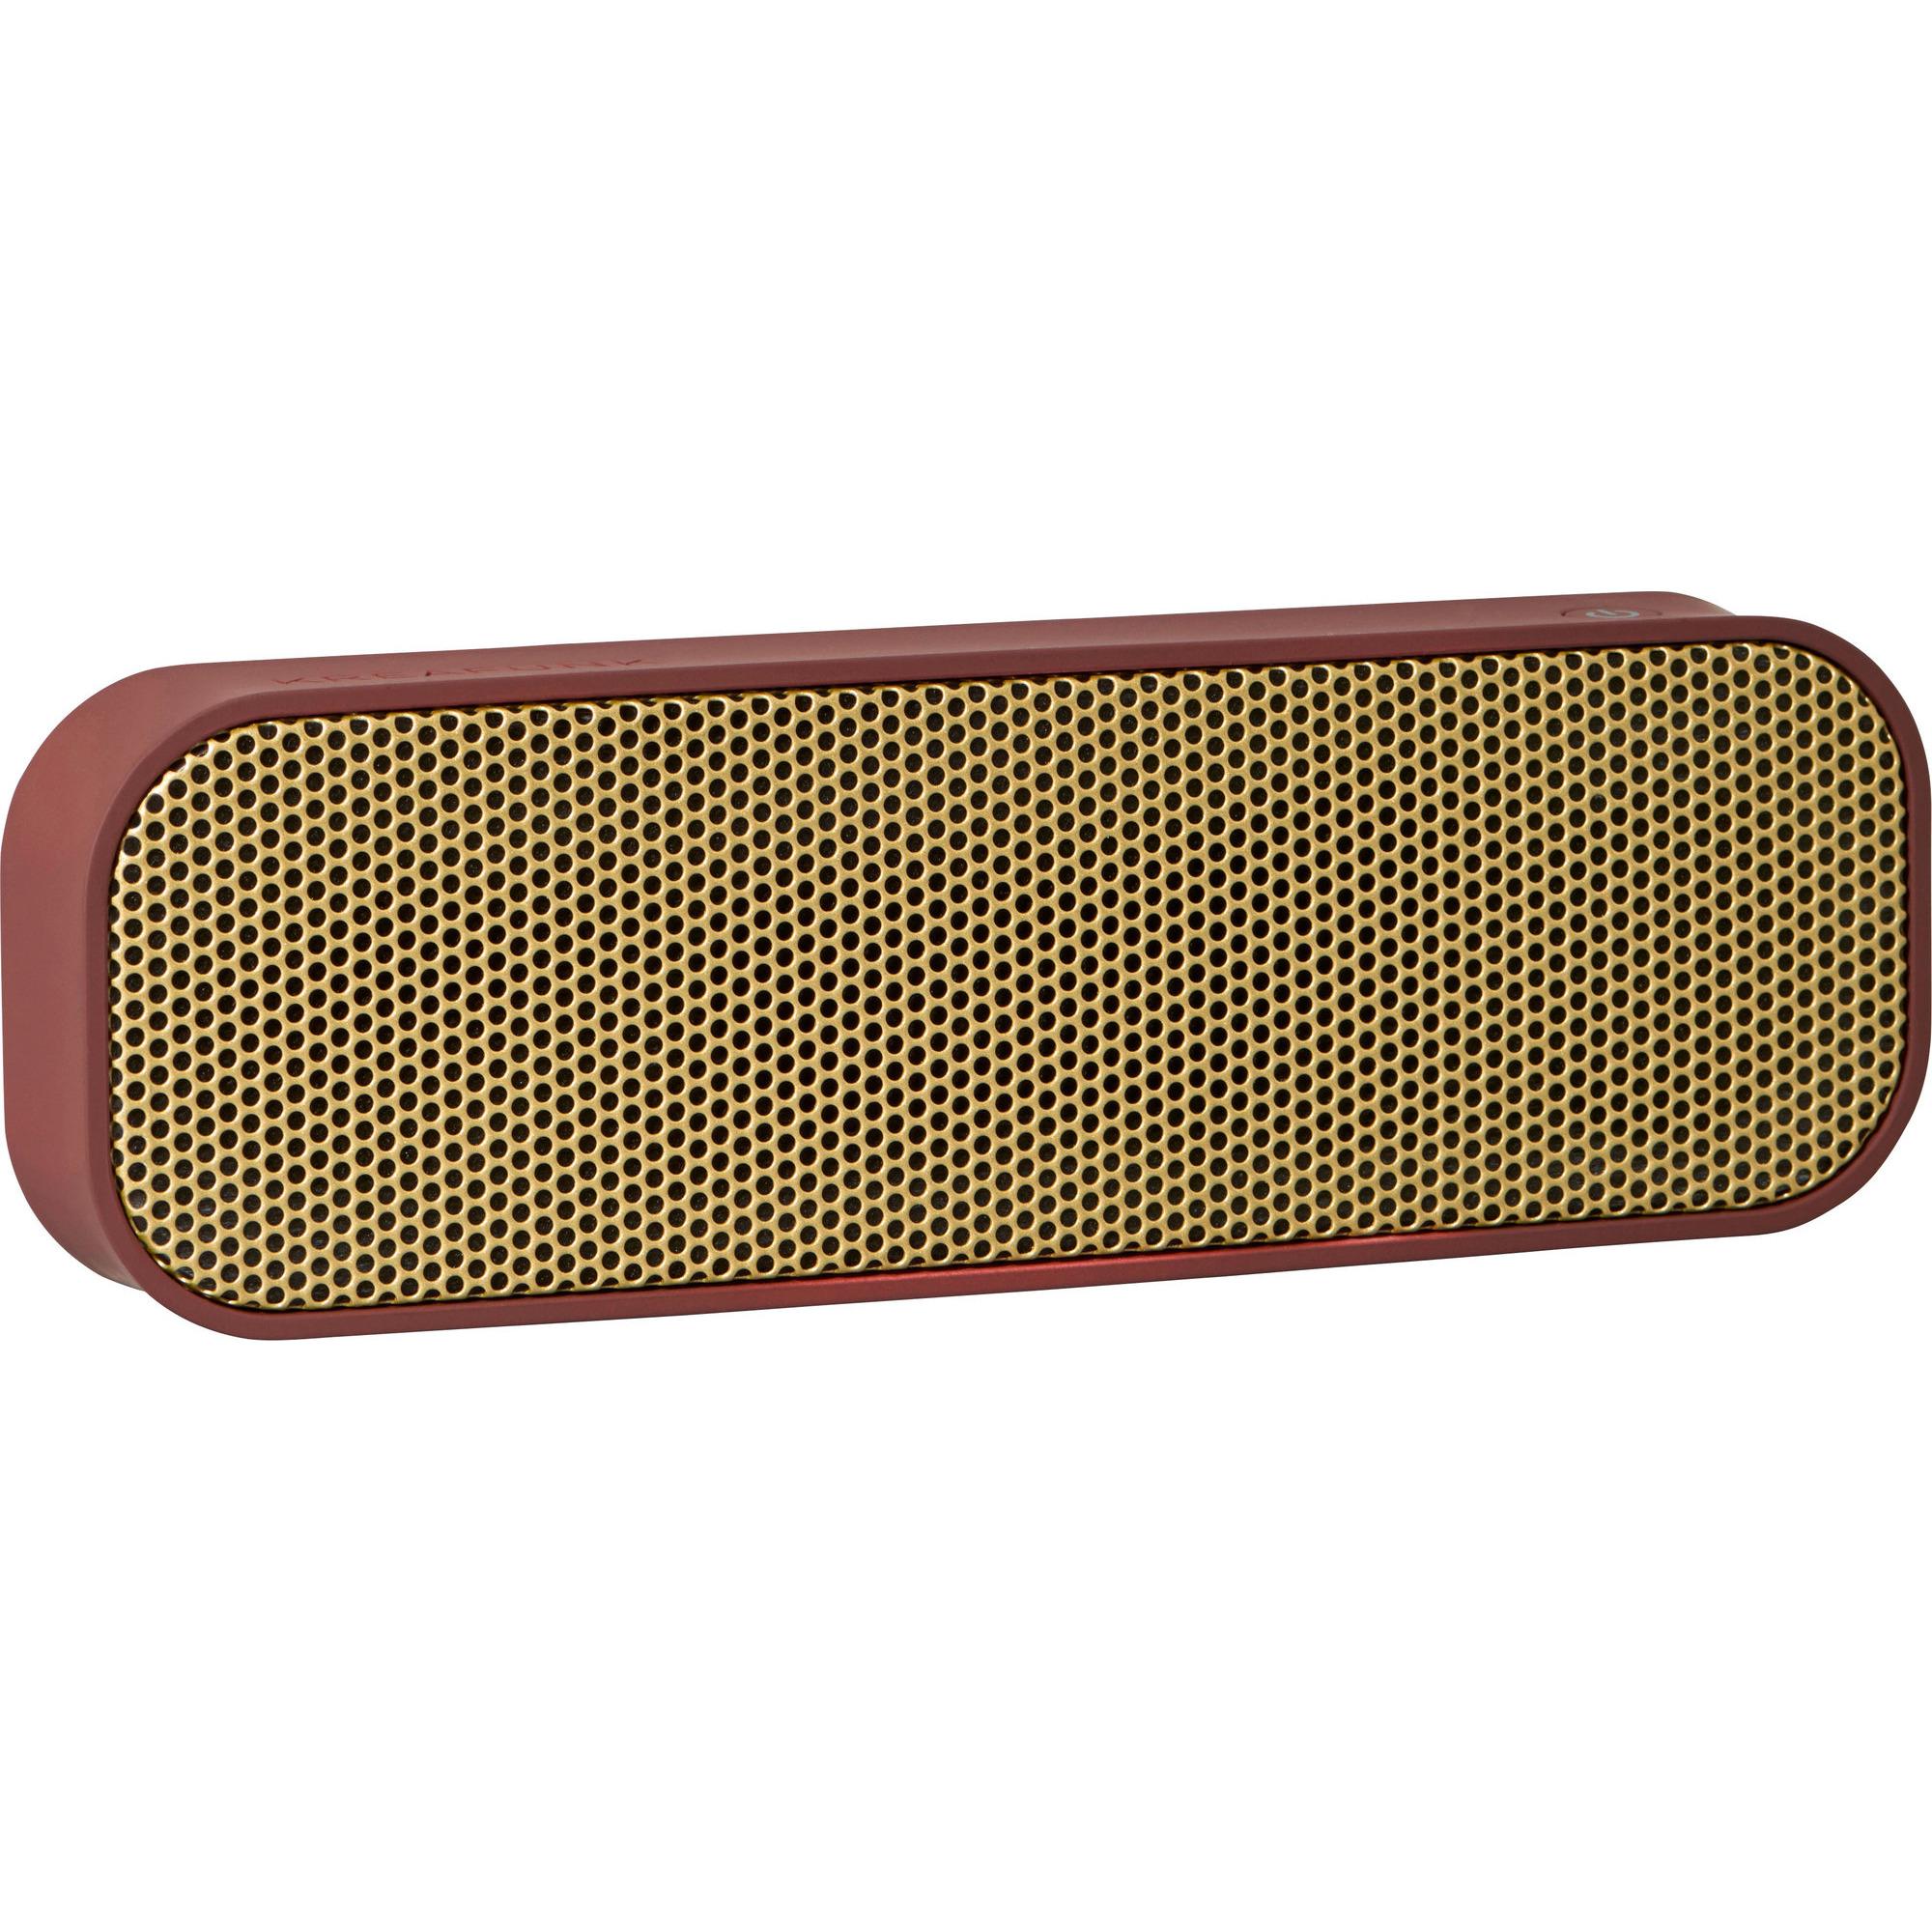 Kreafunk aGROOVE, m. guld front, Bluetooth 3.0. flera färger Plum